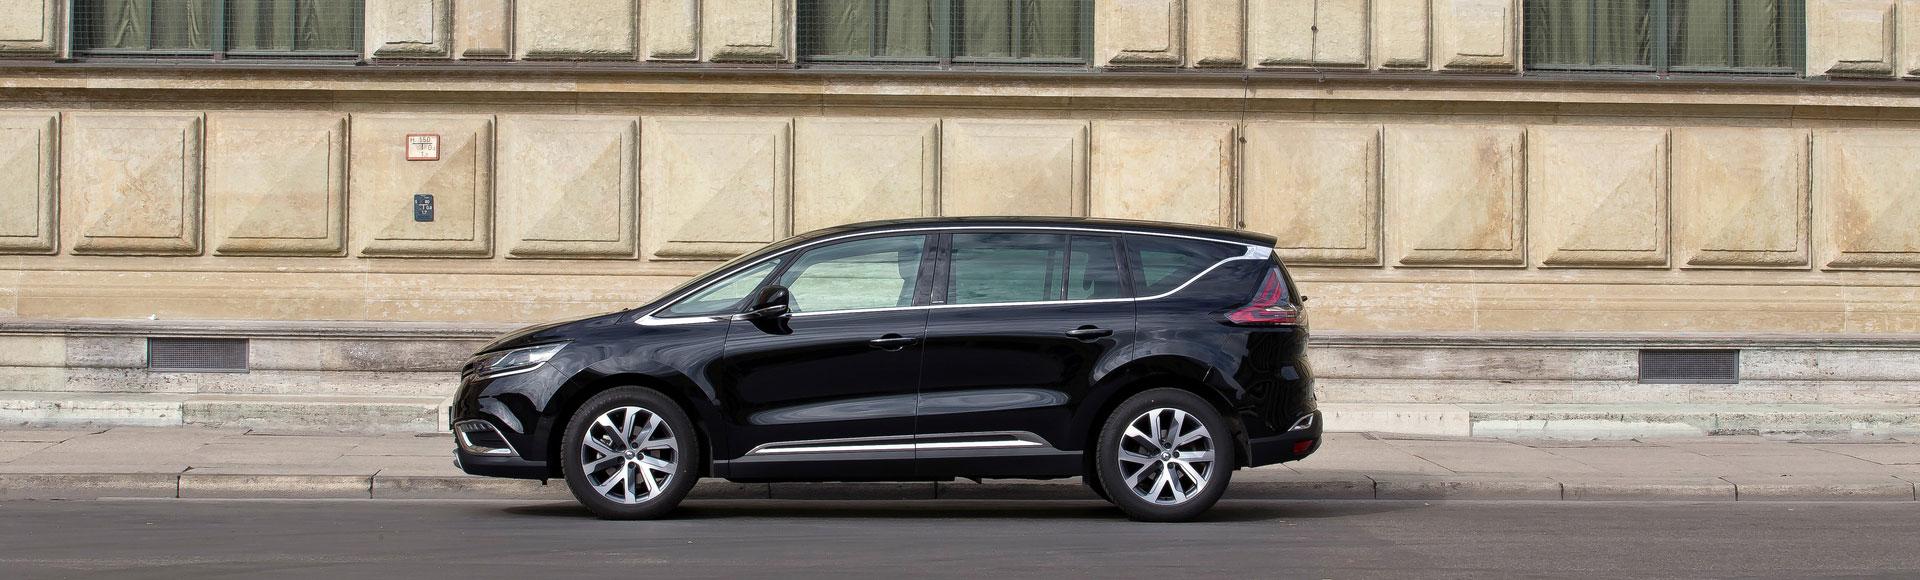 Renault Espace 2016 001